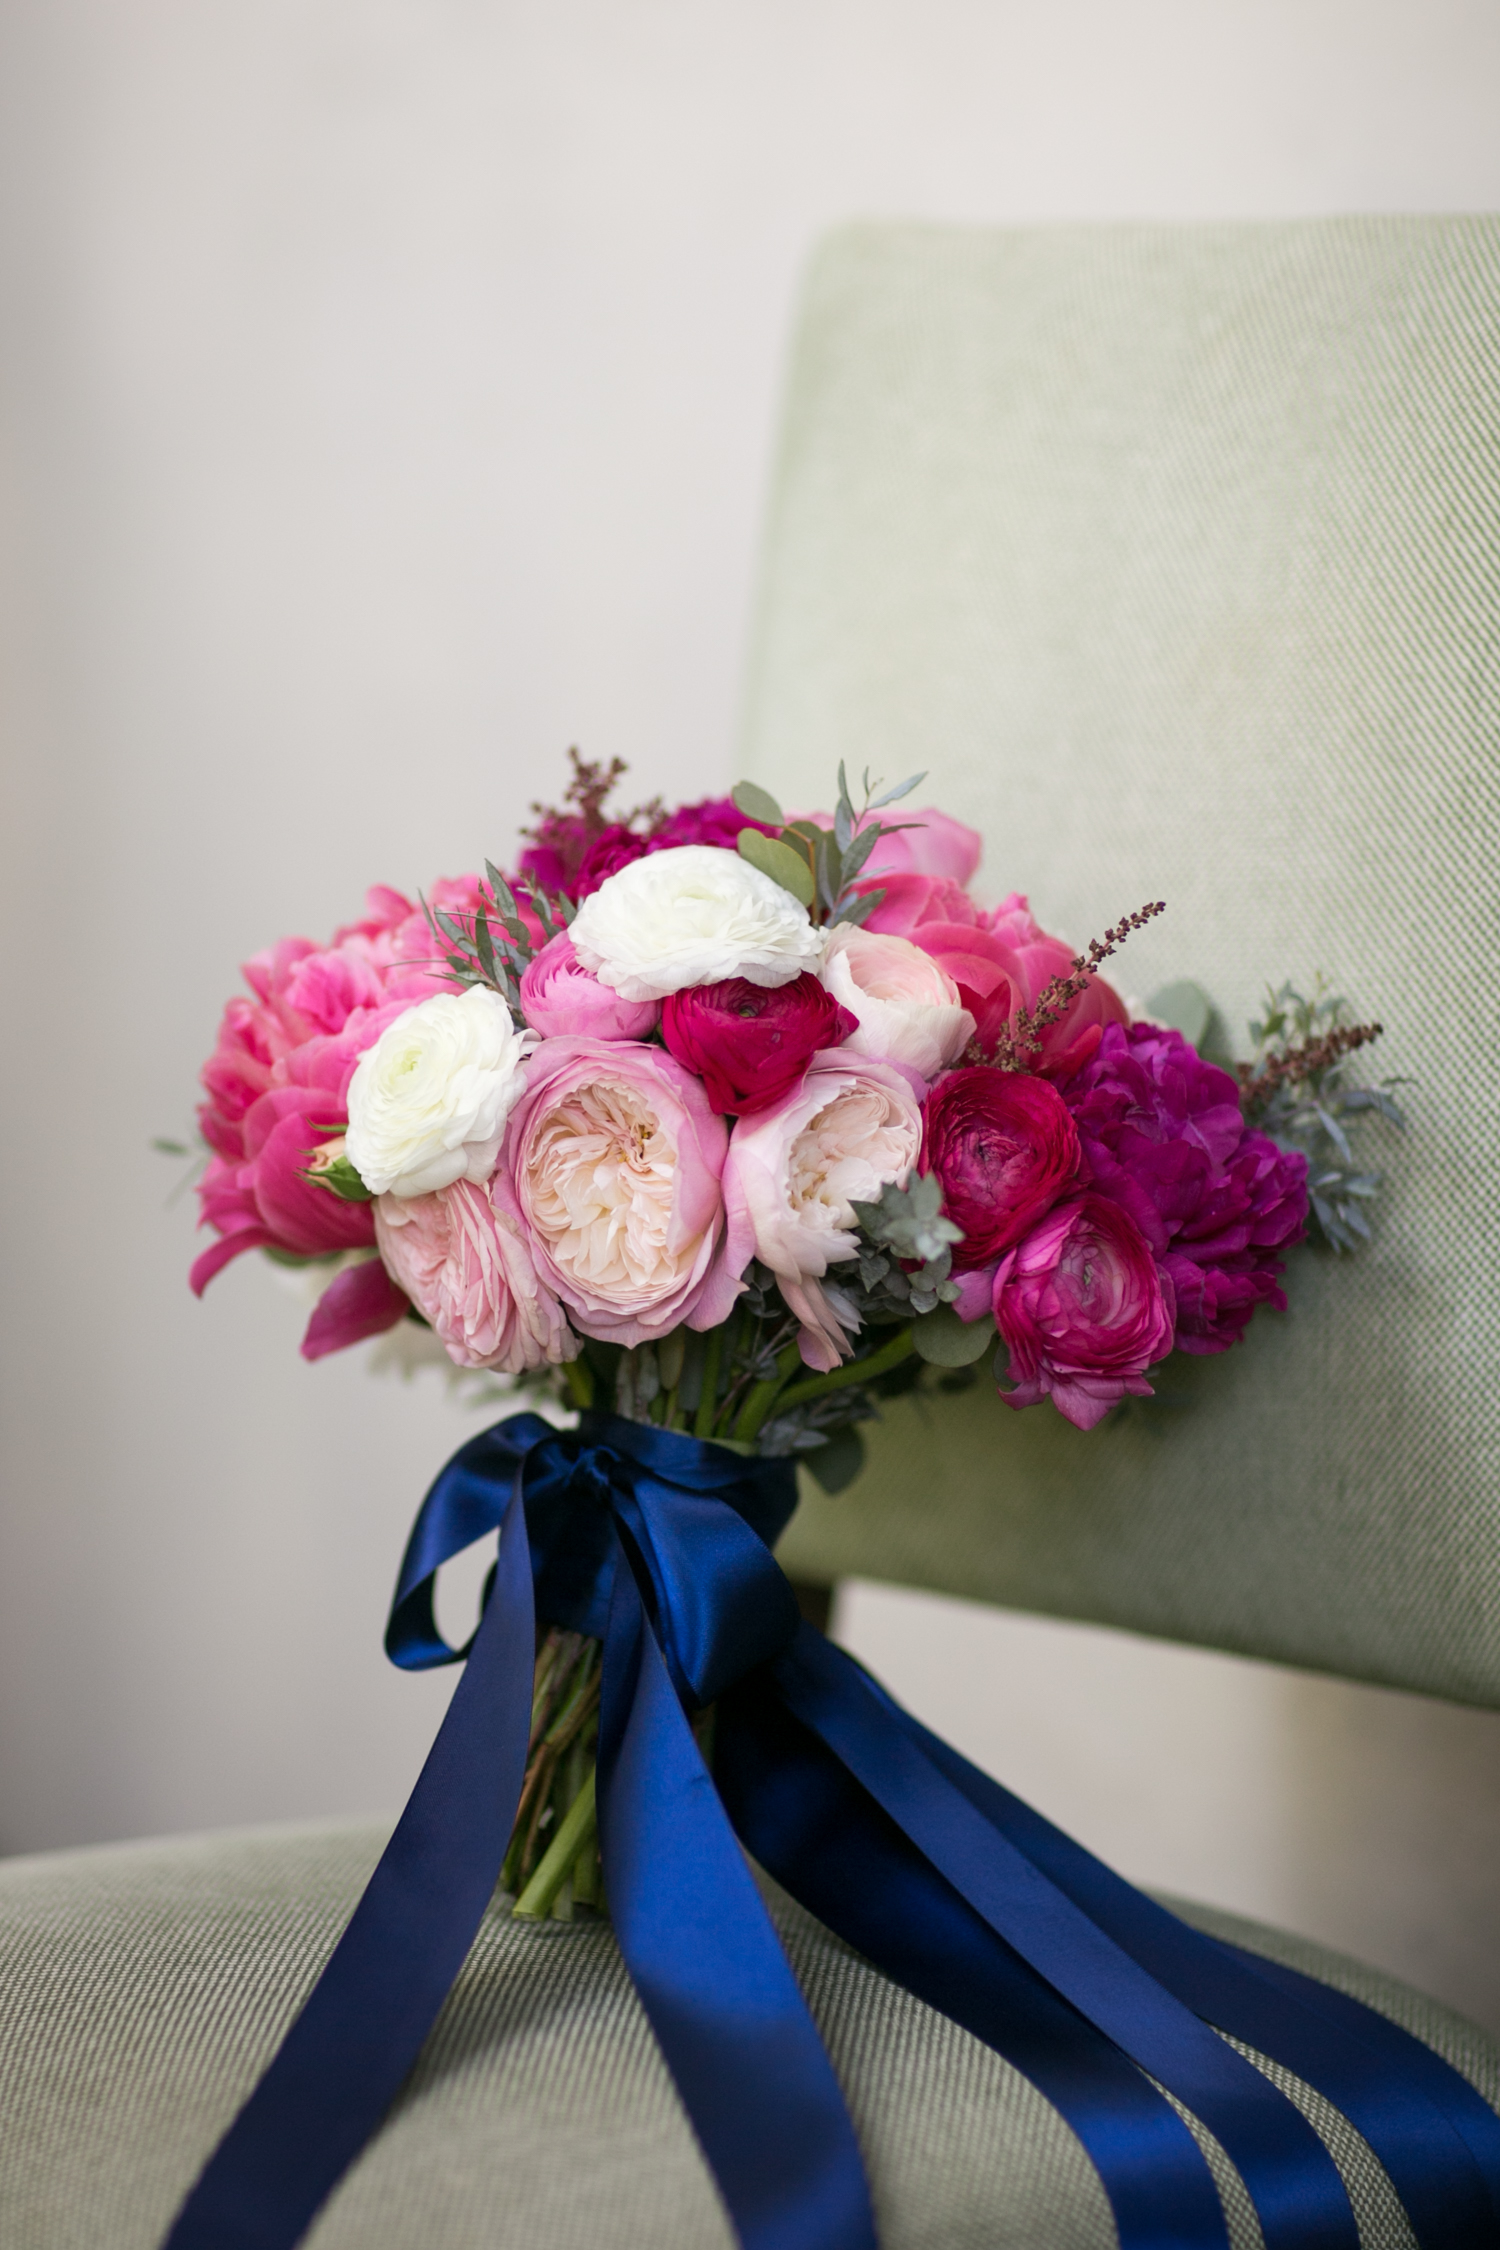 www.santabarbarawedding.com | Miki & Sonja Photography | Four Seasons Resort The Biltmore | Imagine Weddings & Special Events | Rockrose Floral Design | Bride's Bouquet